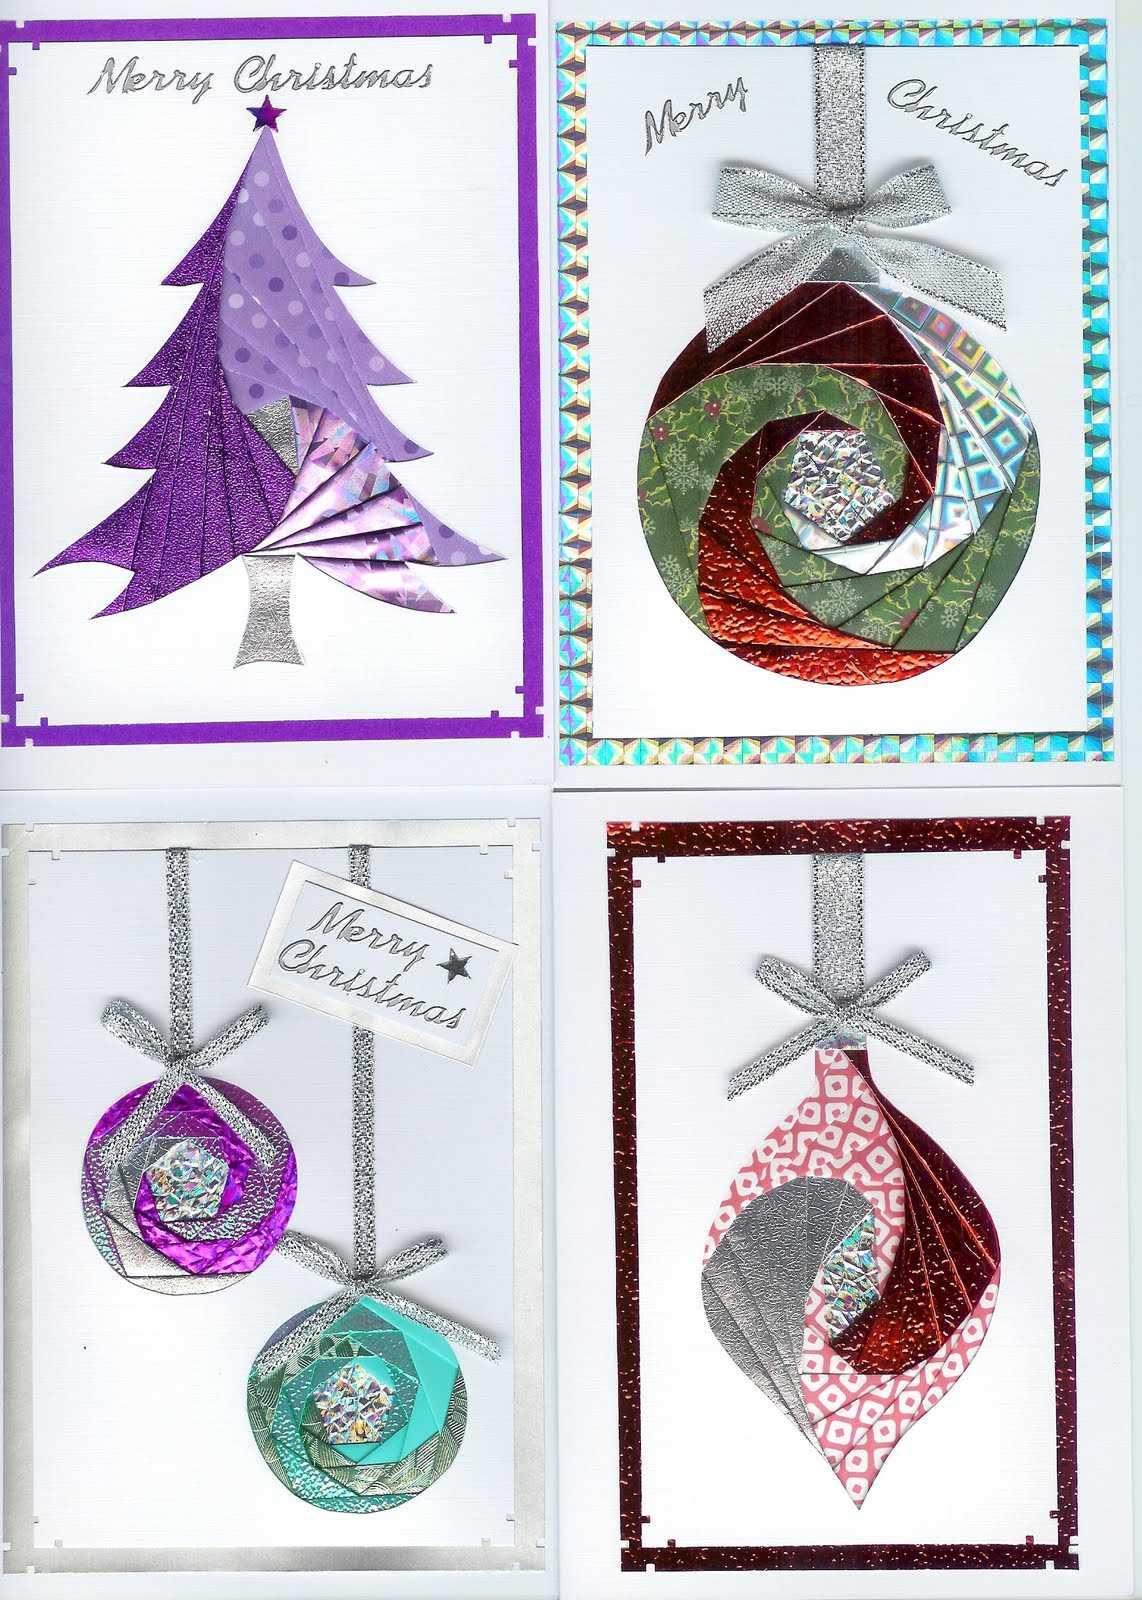 Iris Folding Christmas Cards Templates] Hand Made And Inside Iris Folding Christmas Cards Templates